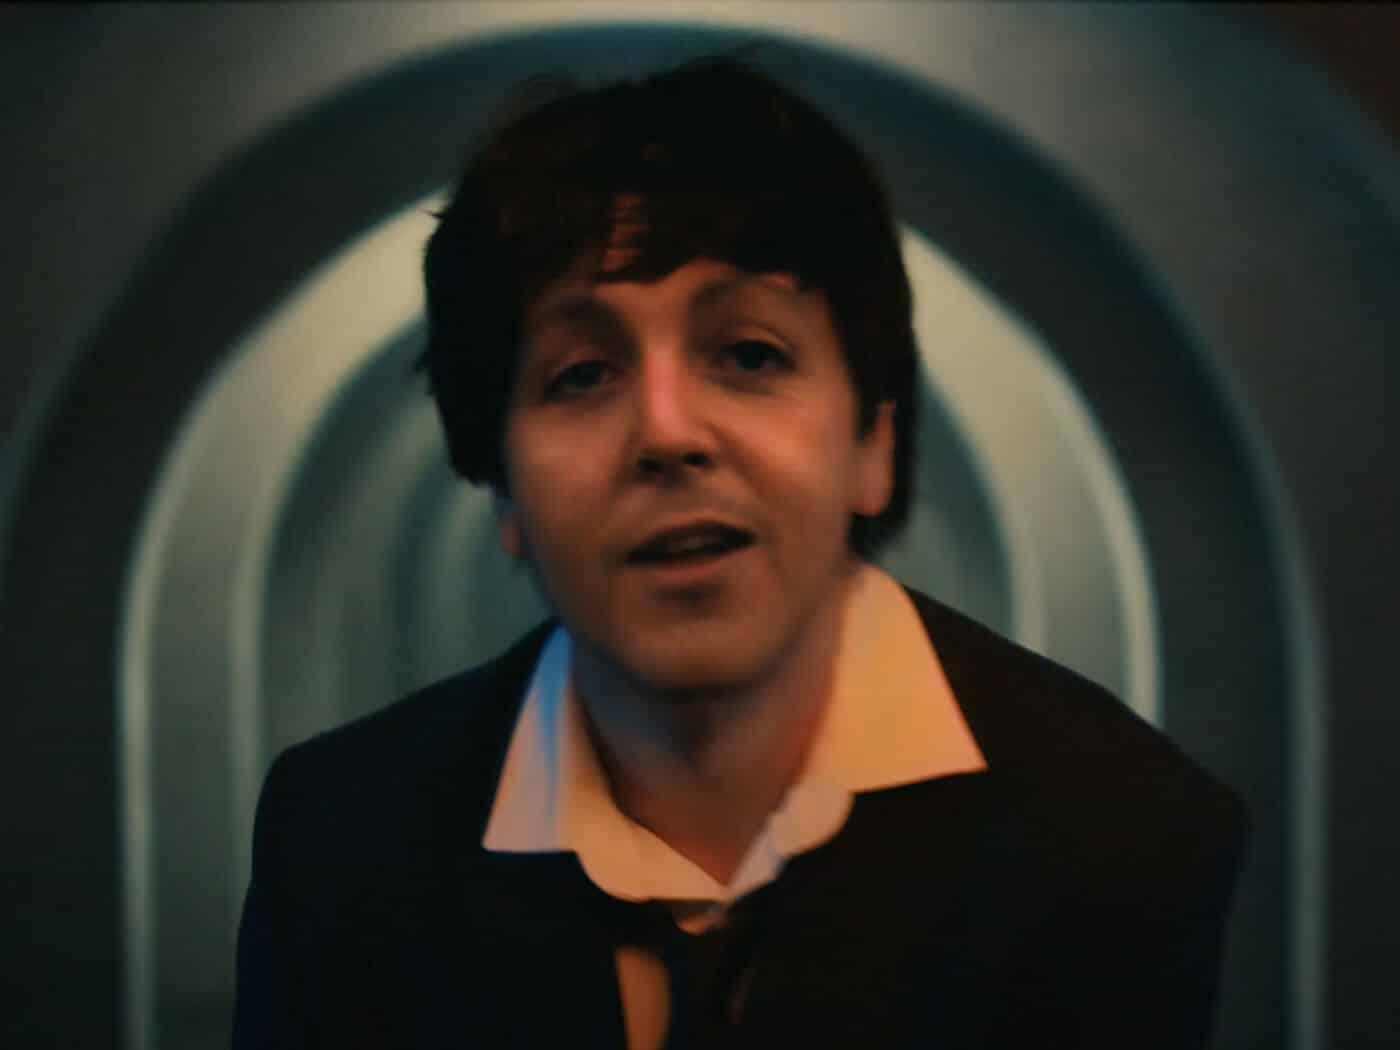 Paul McCartney Find My Way clip